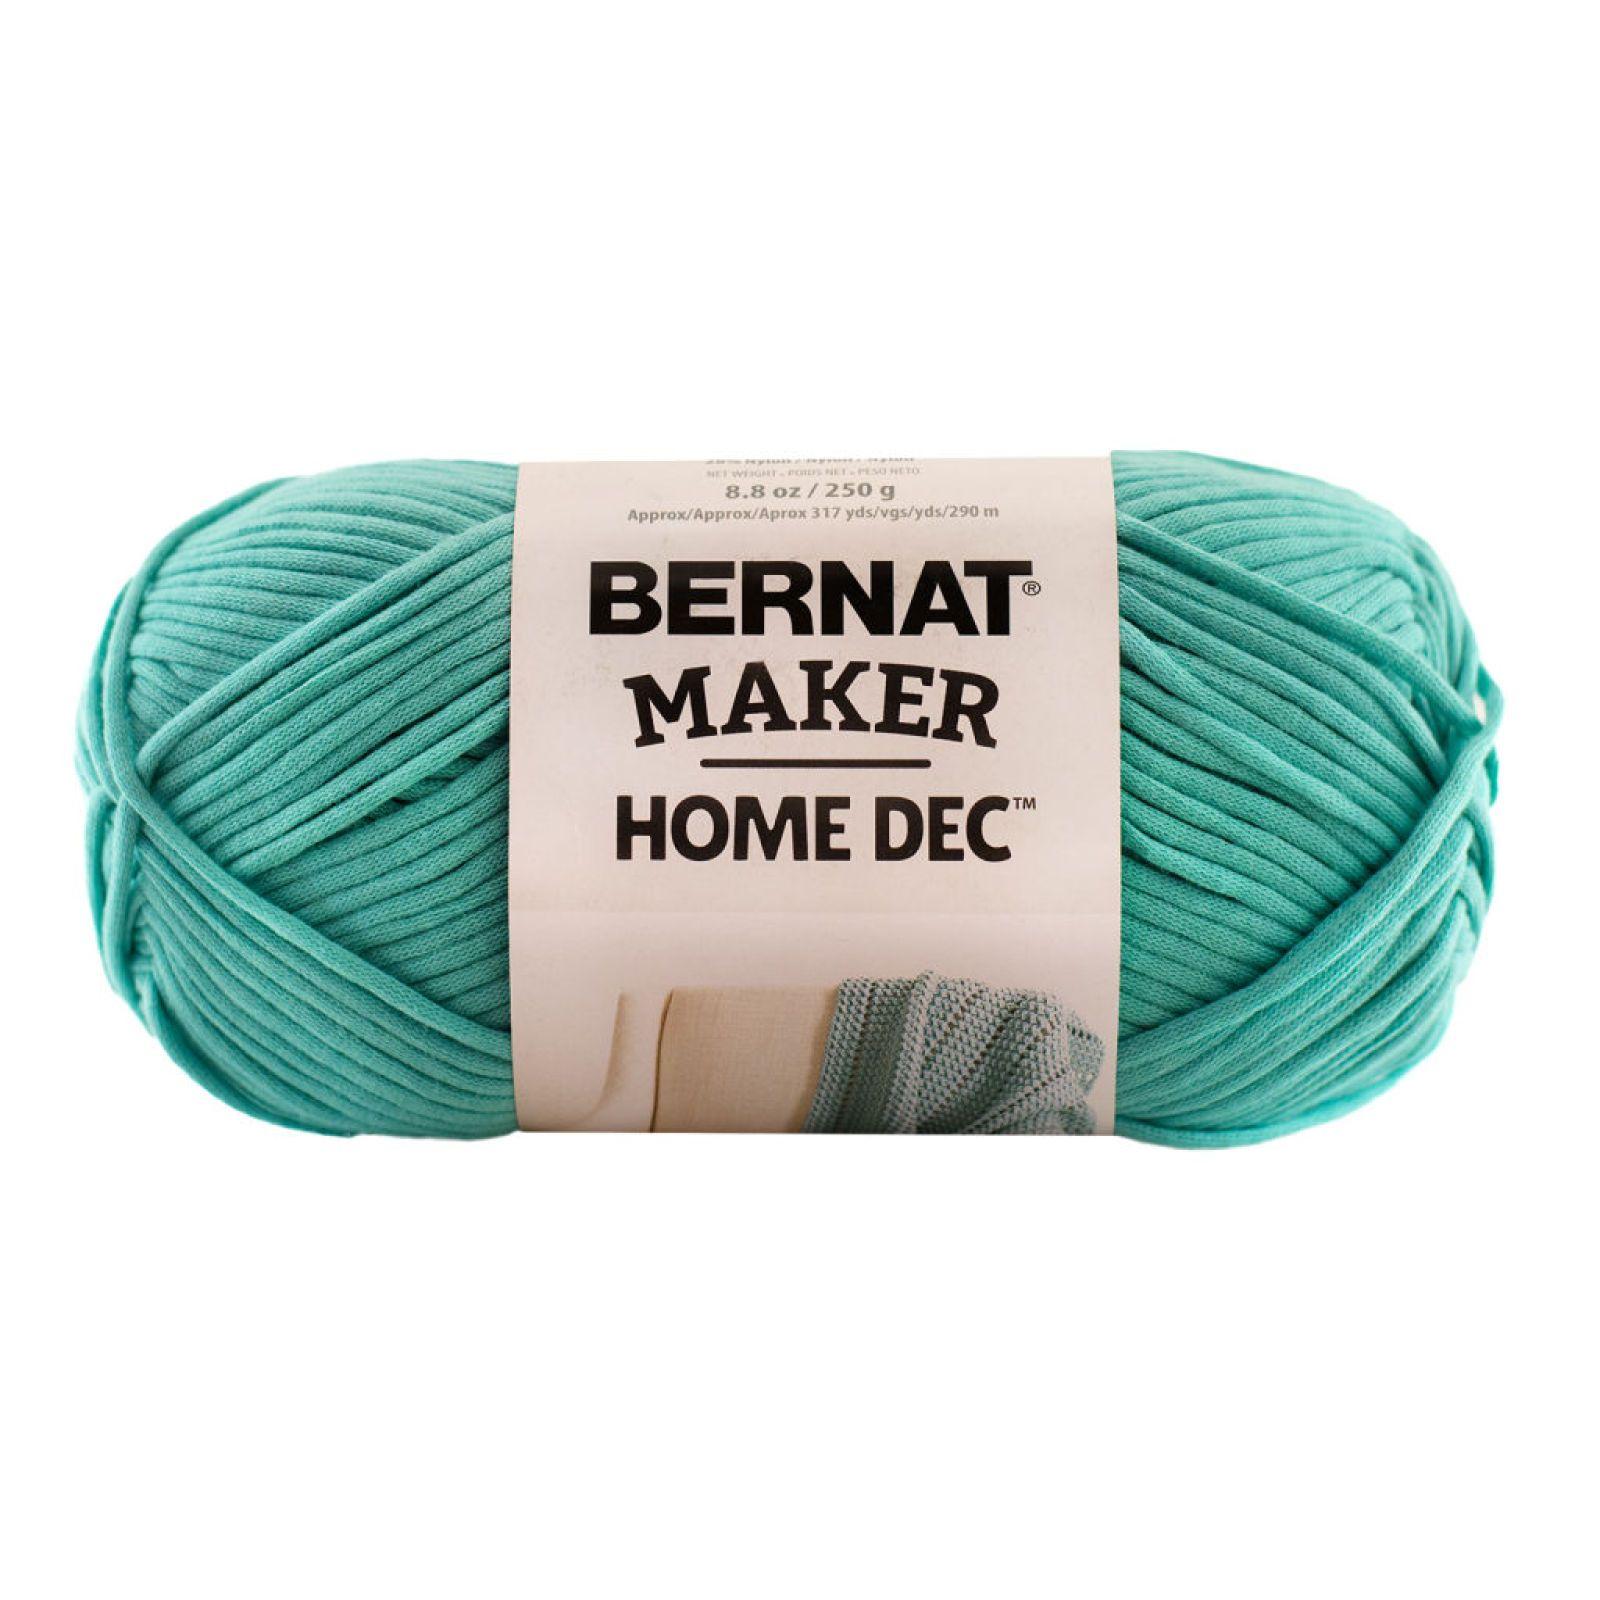 Bernat® Maker Home Dec™ Yarn